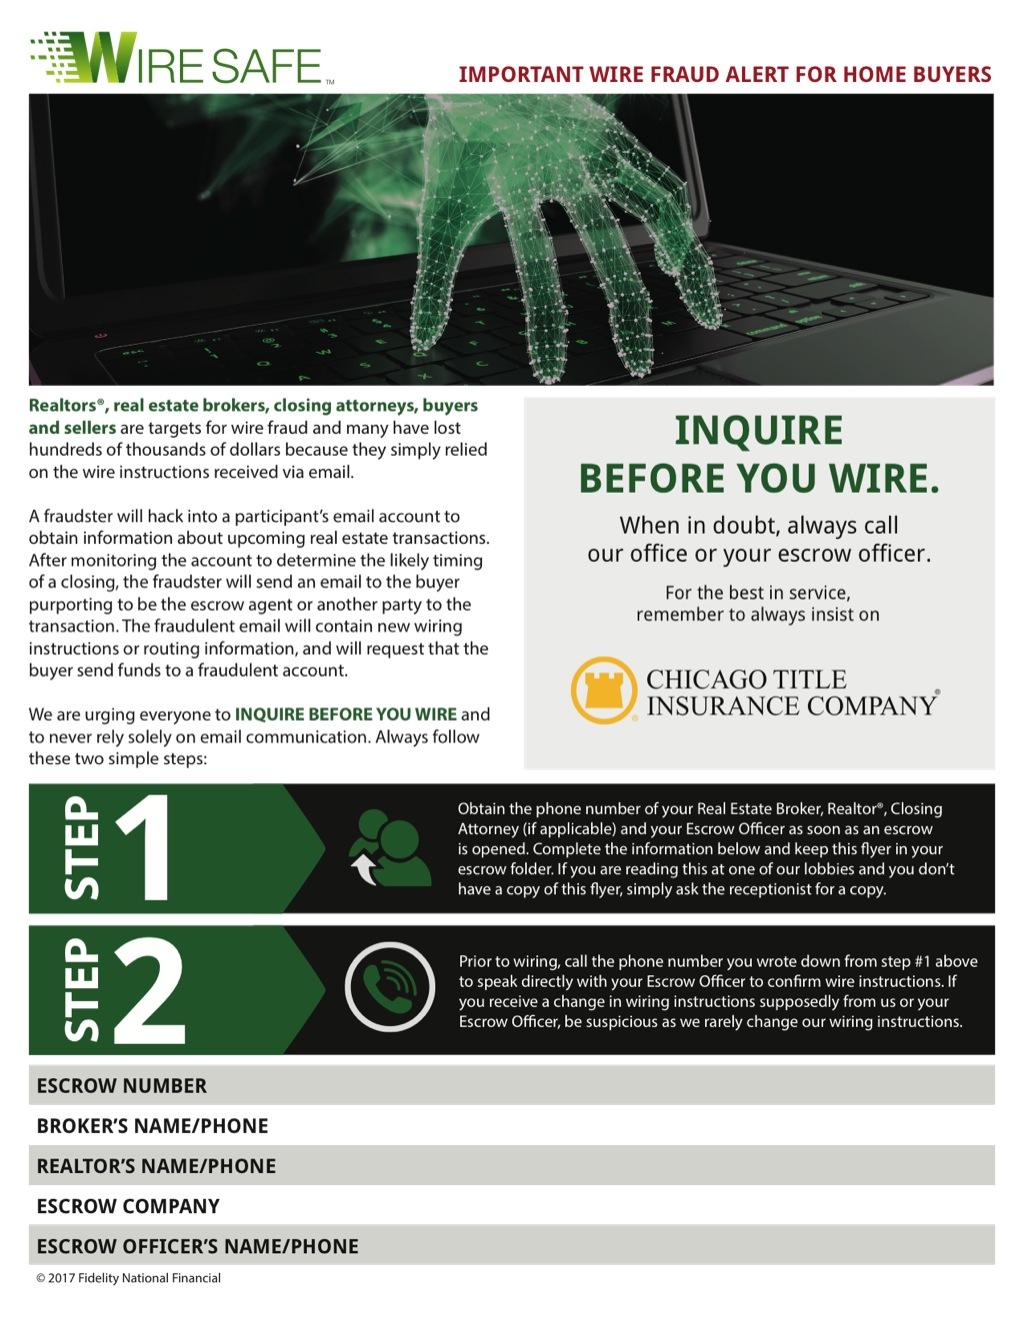 Corefact Wire Safe Buyer Flyer - CTIC